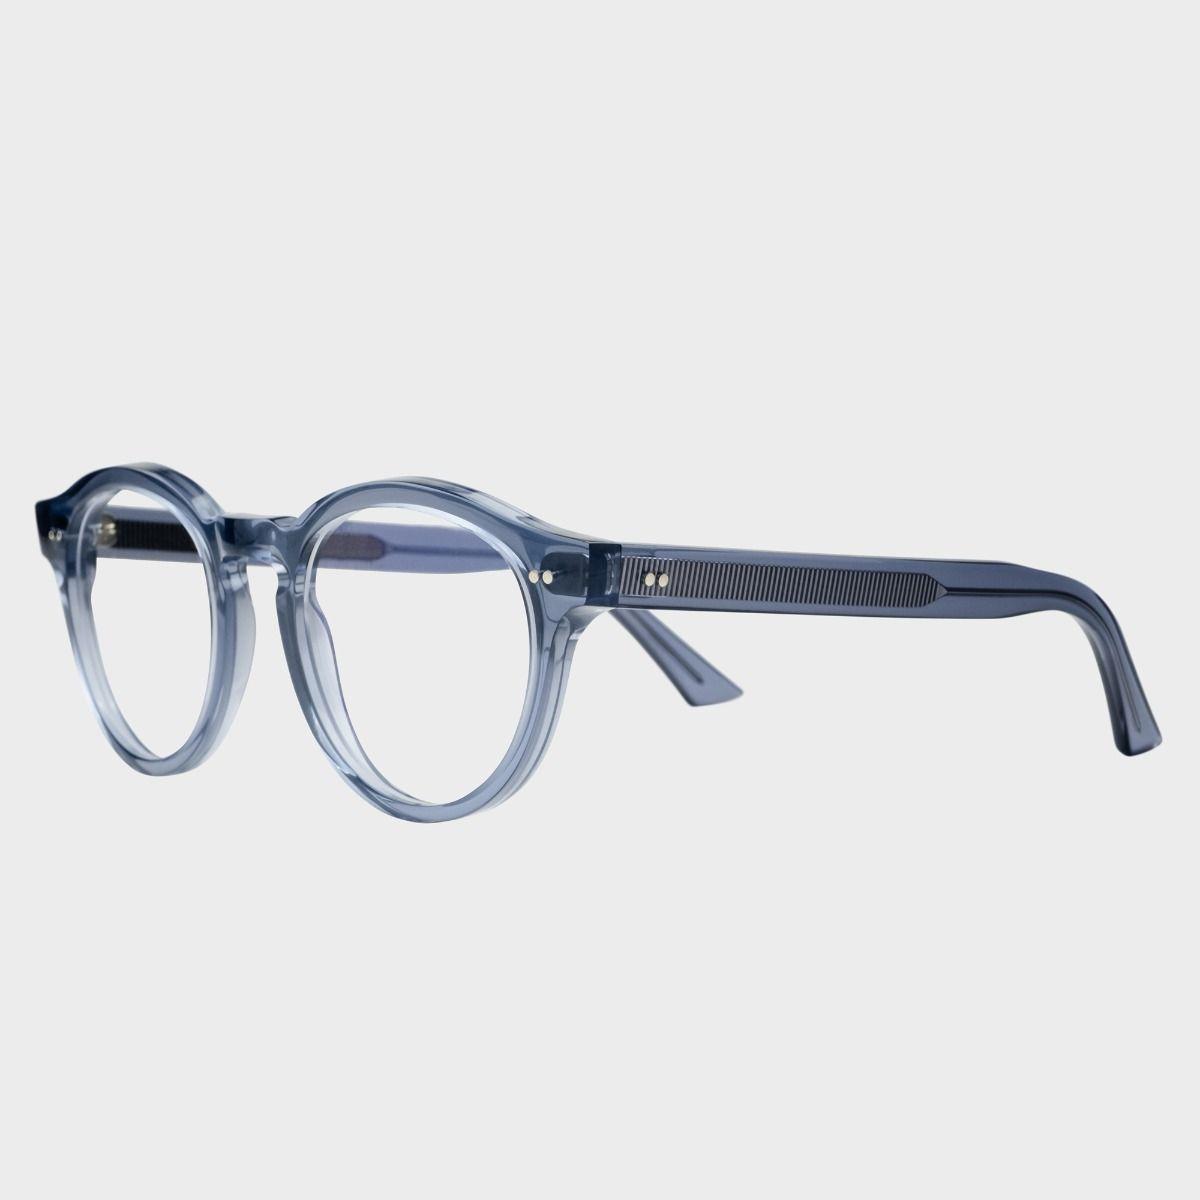 1378 Blue Light Filter Optical Round Glasses-Brooklyn Blue